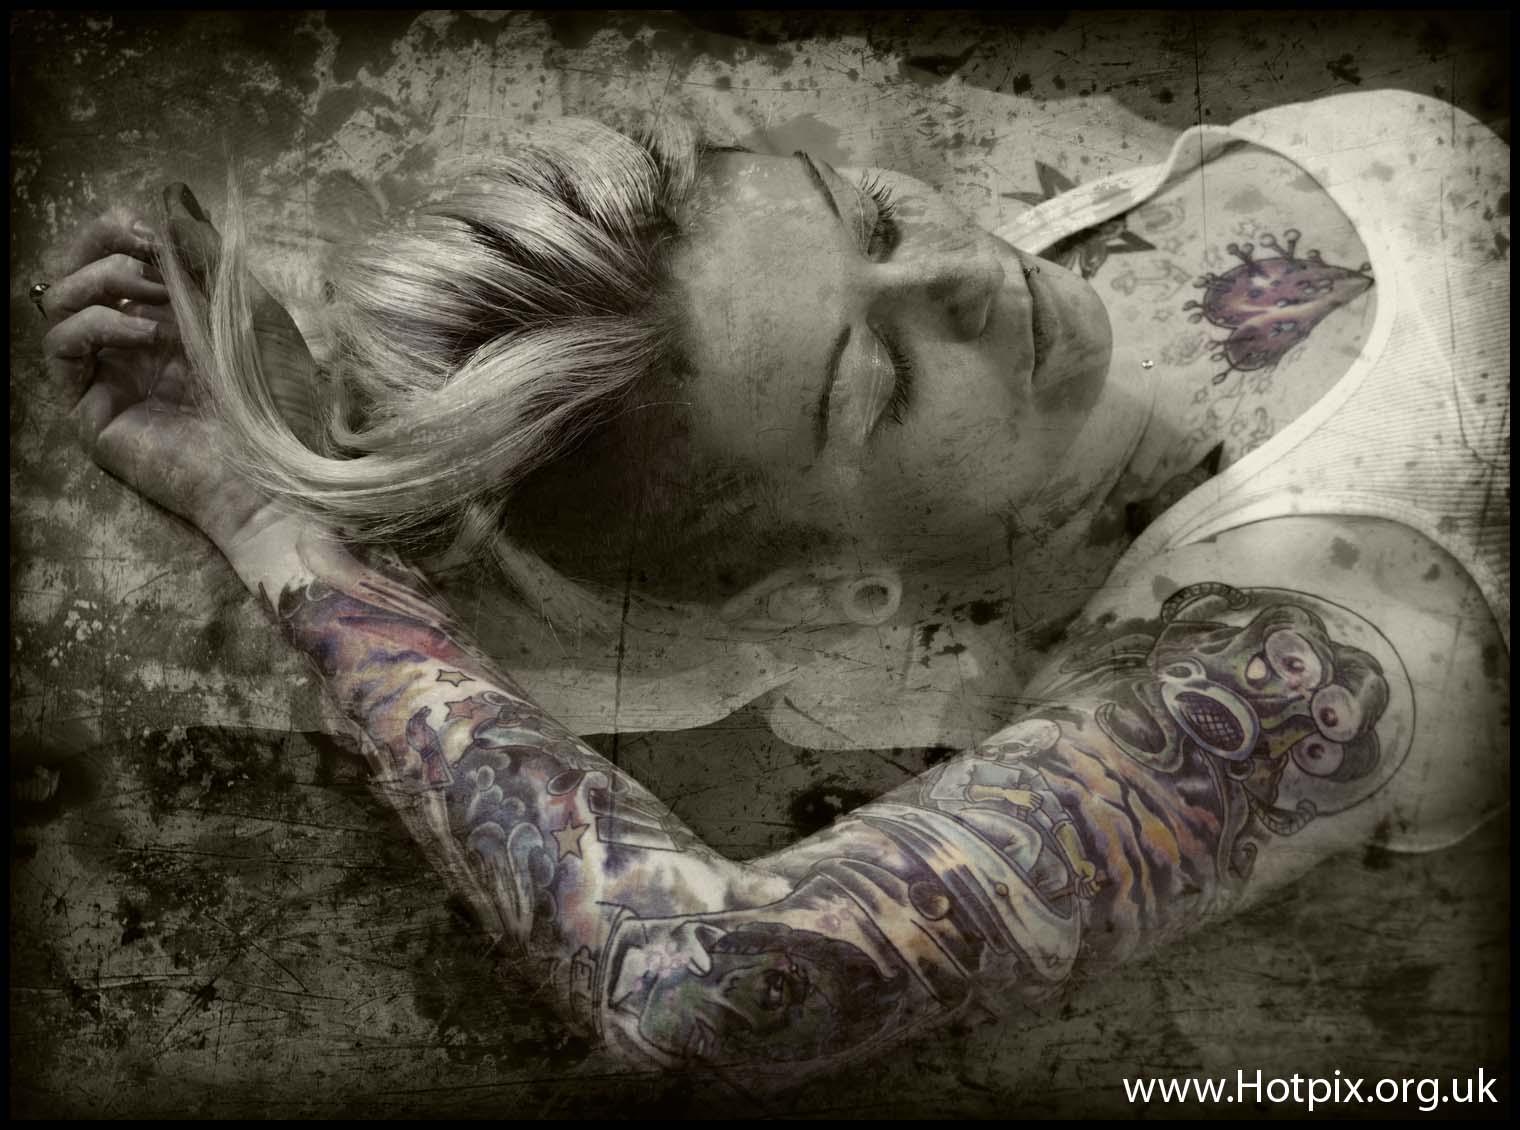 tat2,tatoo,tattoo,tatto,body,woman,lady,female,sleep,sleeping,ink,skin,beauty,tats,needle,hotpix,tonysmith,sepia,selective,colour,color,colores,B/W,mono,portrait,face,portraits,goth,babe,babes,gothic,porn,porno,pornography,racy,sex,sexy,dirty,texture,hot,textured,hotpicks,muchacha,femenina,de,la,mujer,se\u00f1ora,girl,\u5973\u6027\u30e1\u30b9\u306e\u5973\u6027\u306e\u5973\u306e\u5b50,\u592b\u4eba\u5973\u6027\u5987\u5973\u5973\u5b69,fille,f\u00e9minine,femme,dame,tony smith photography,tdktony,tdk,tony,tdktonysmith,@hotpixuk